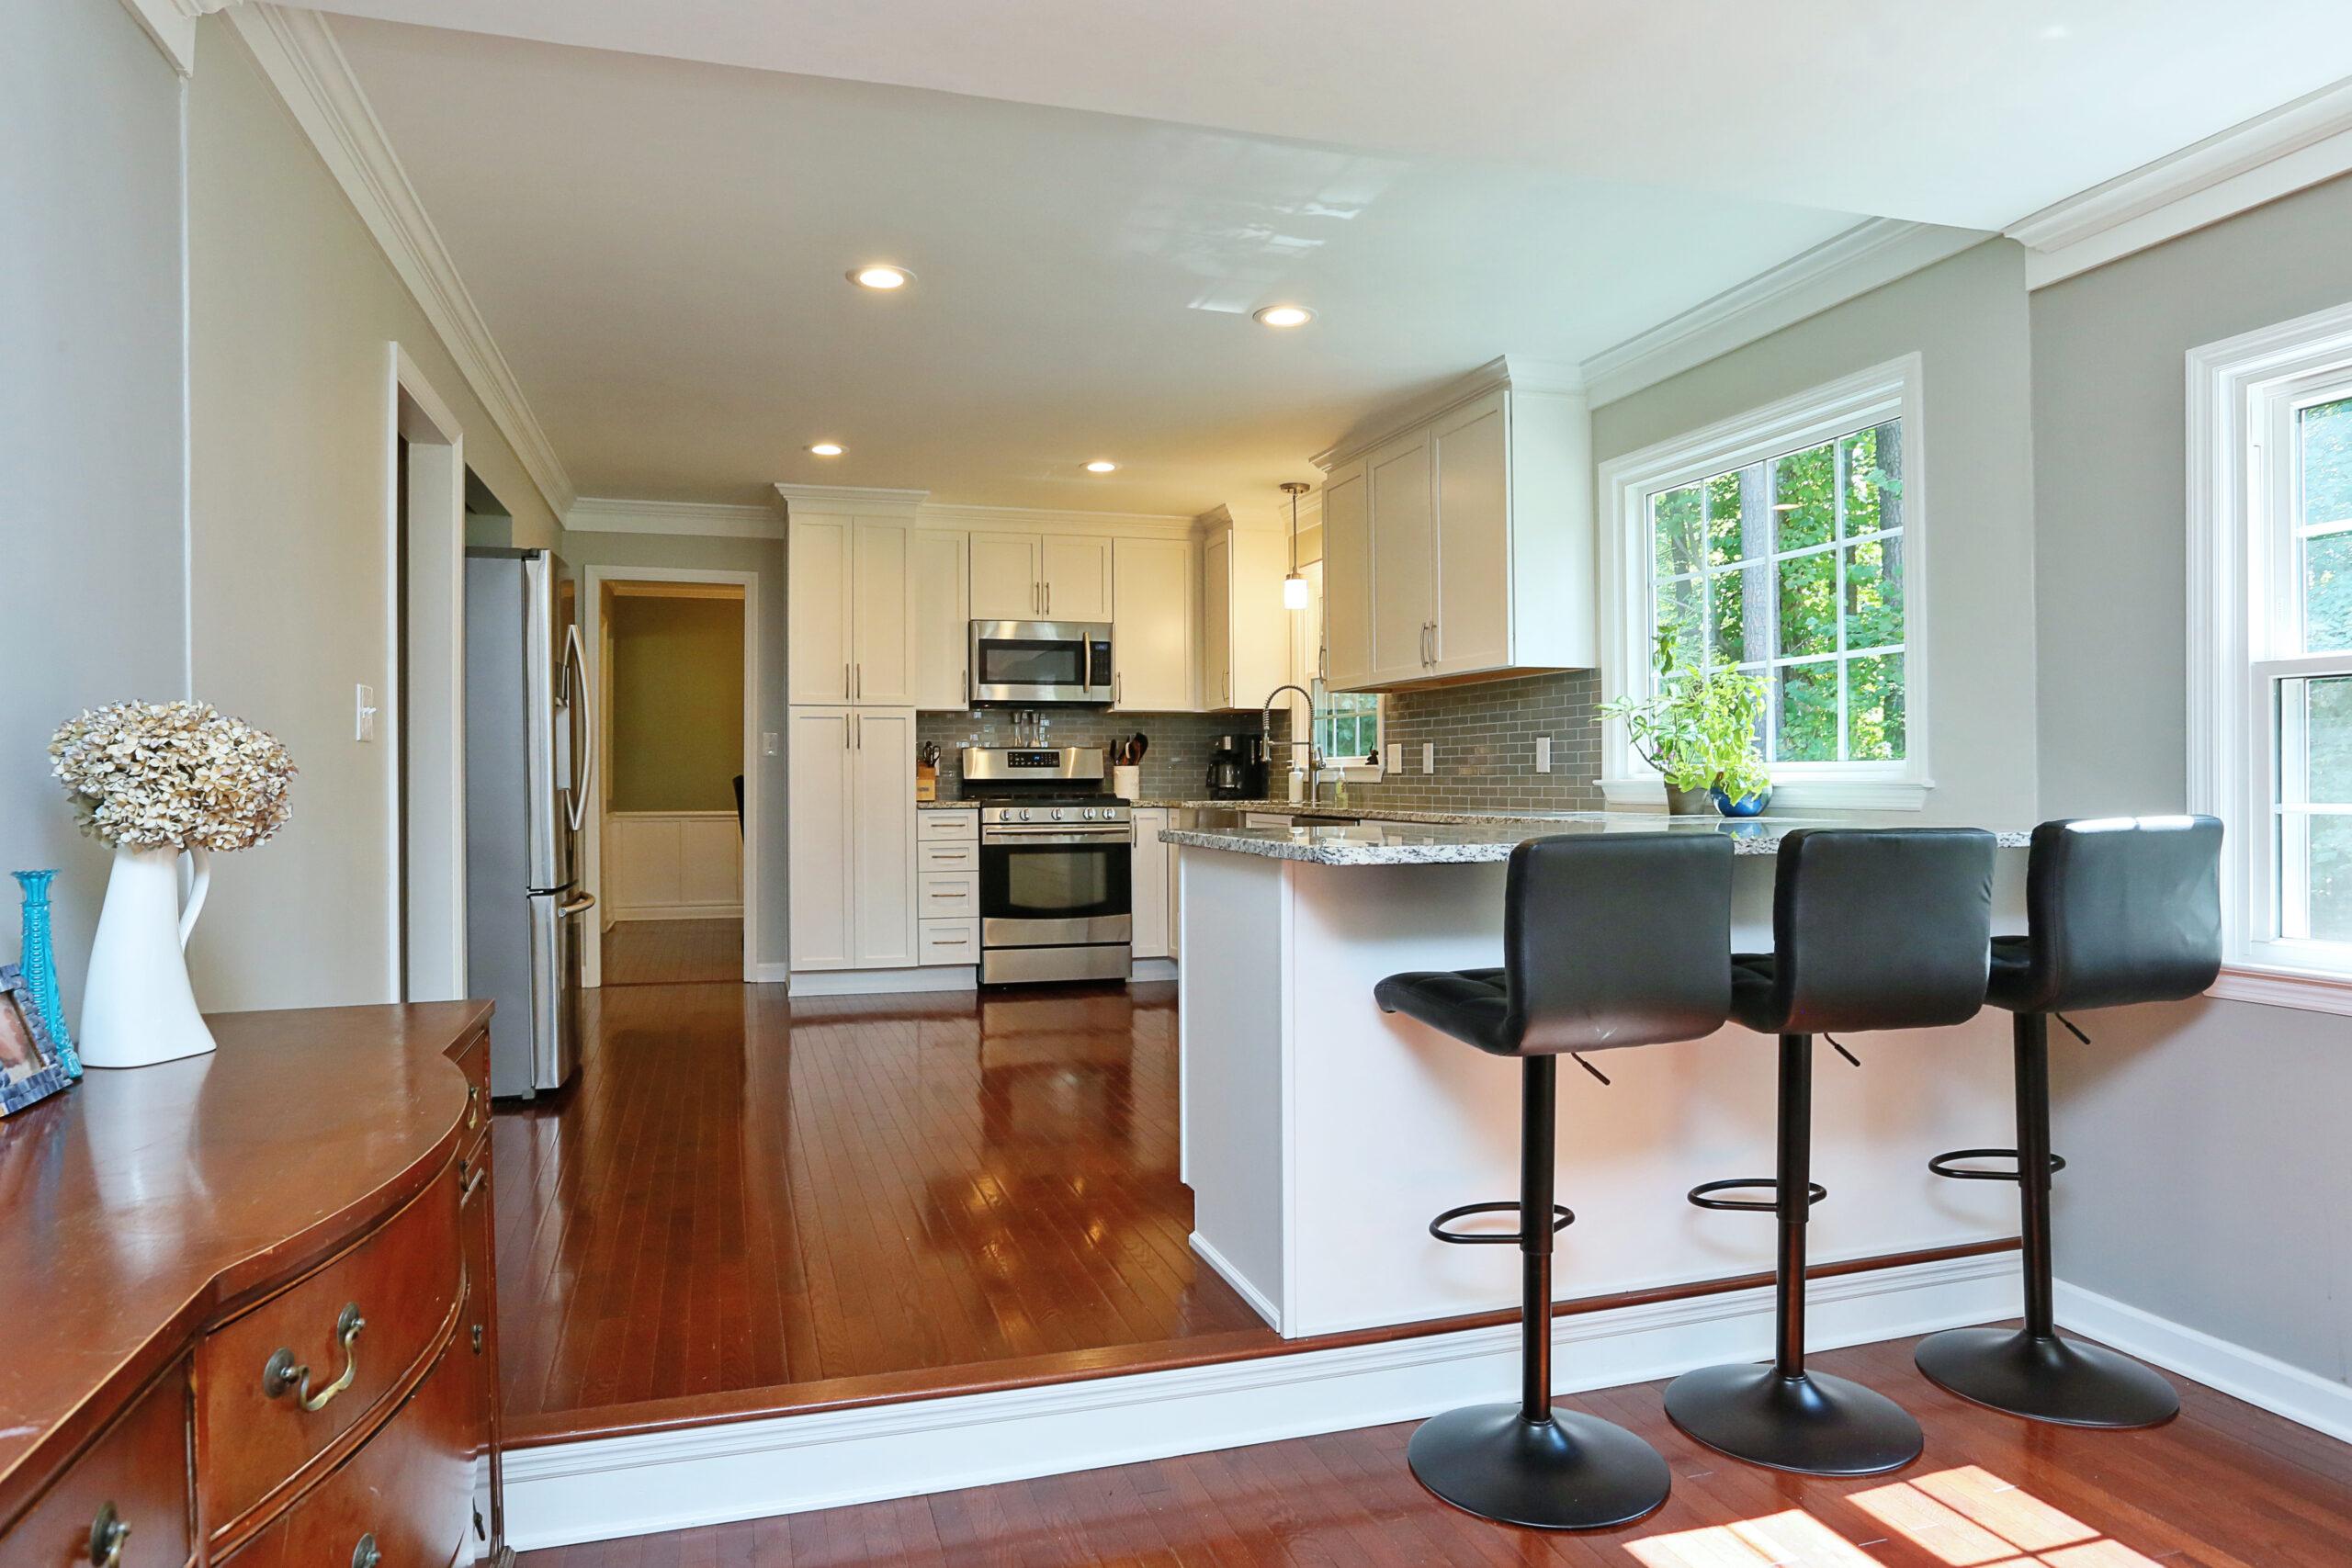 Kitchen Cabinets Raleigh Transitional Savannah1 Alpine White Paint Shaker Granite Crown